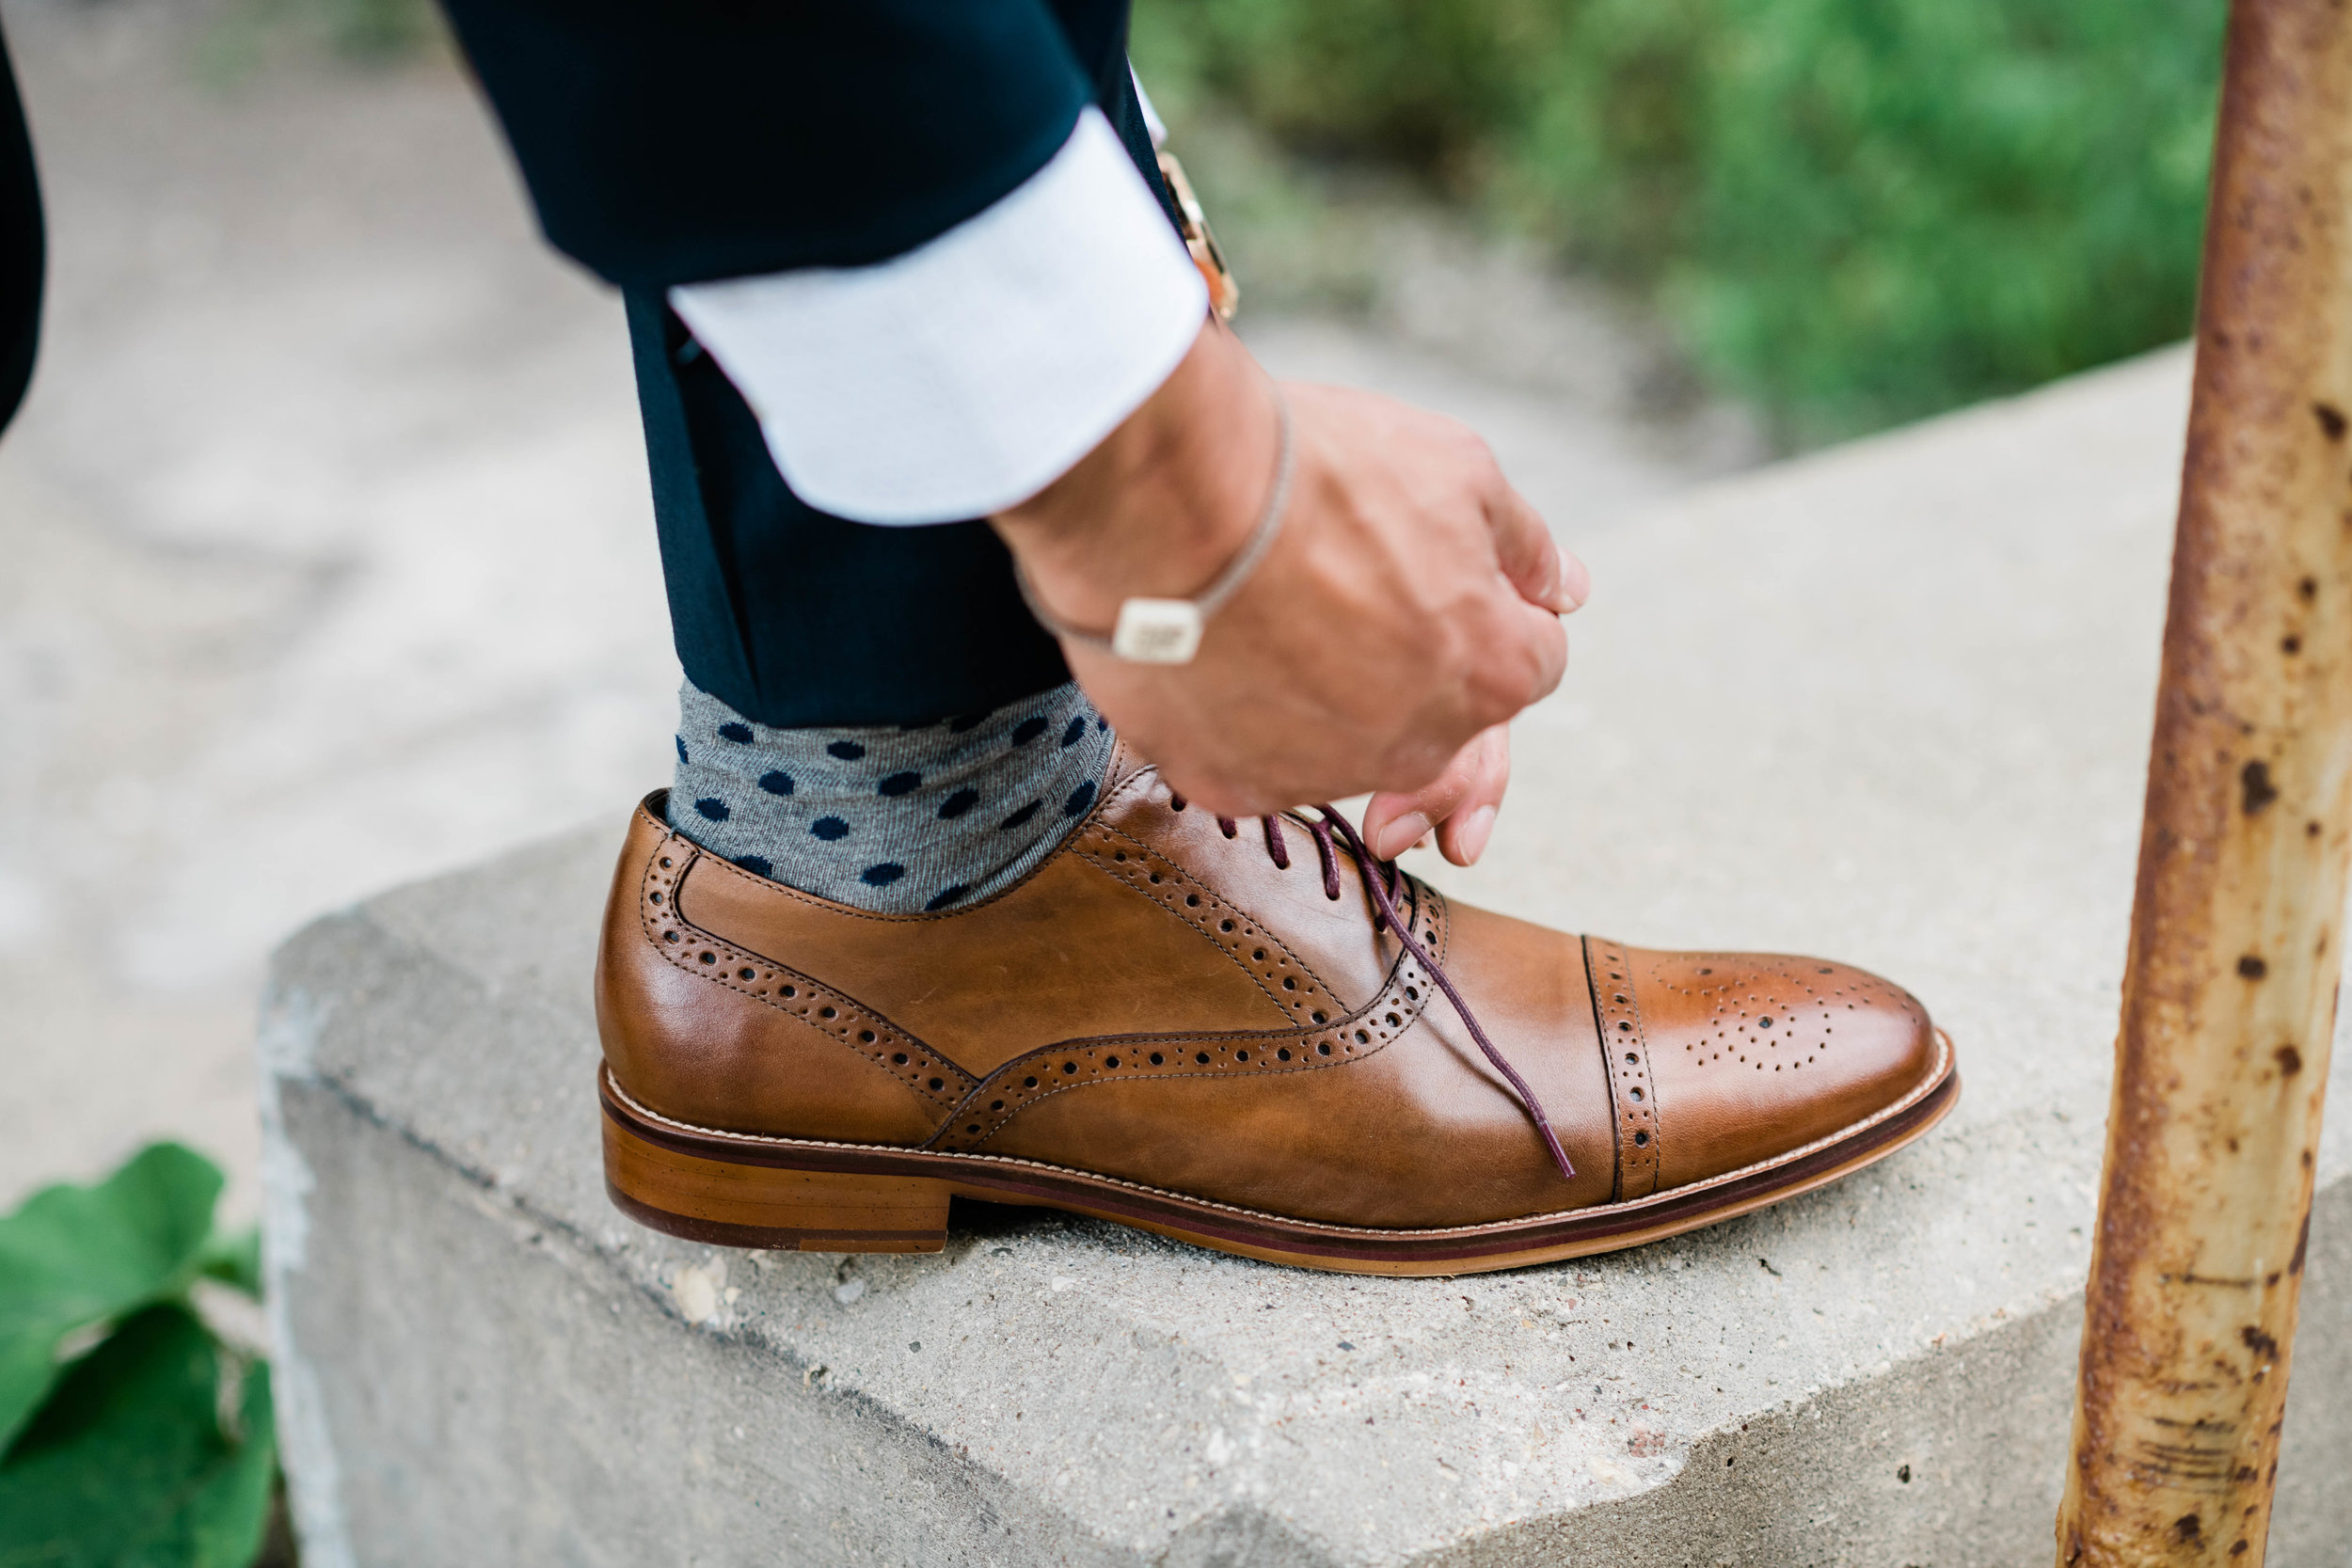 Groom tying his shoe